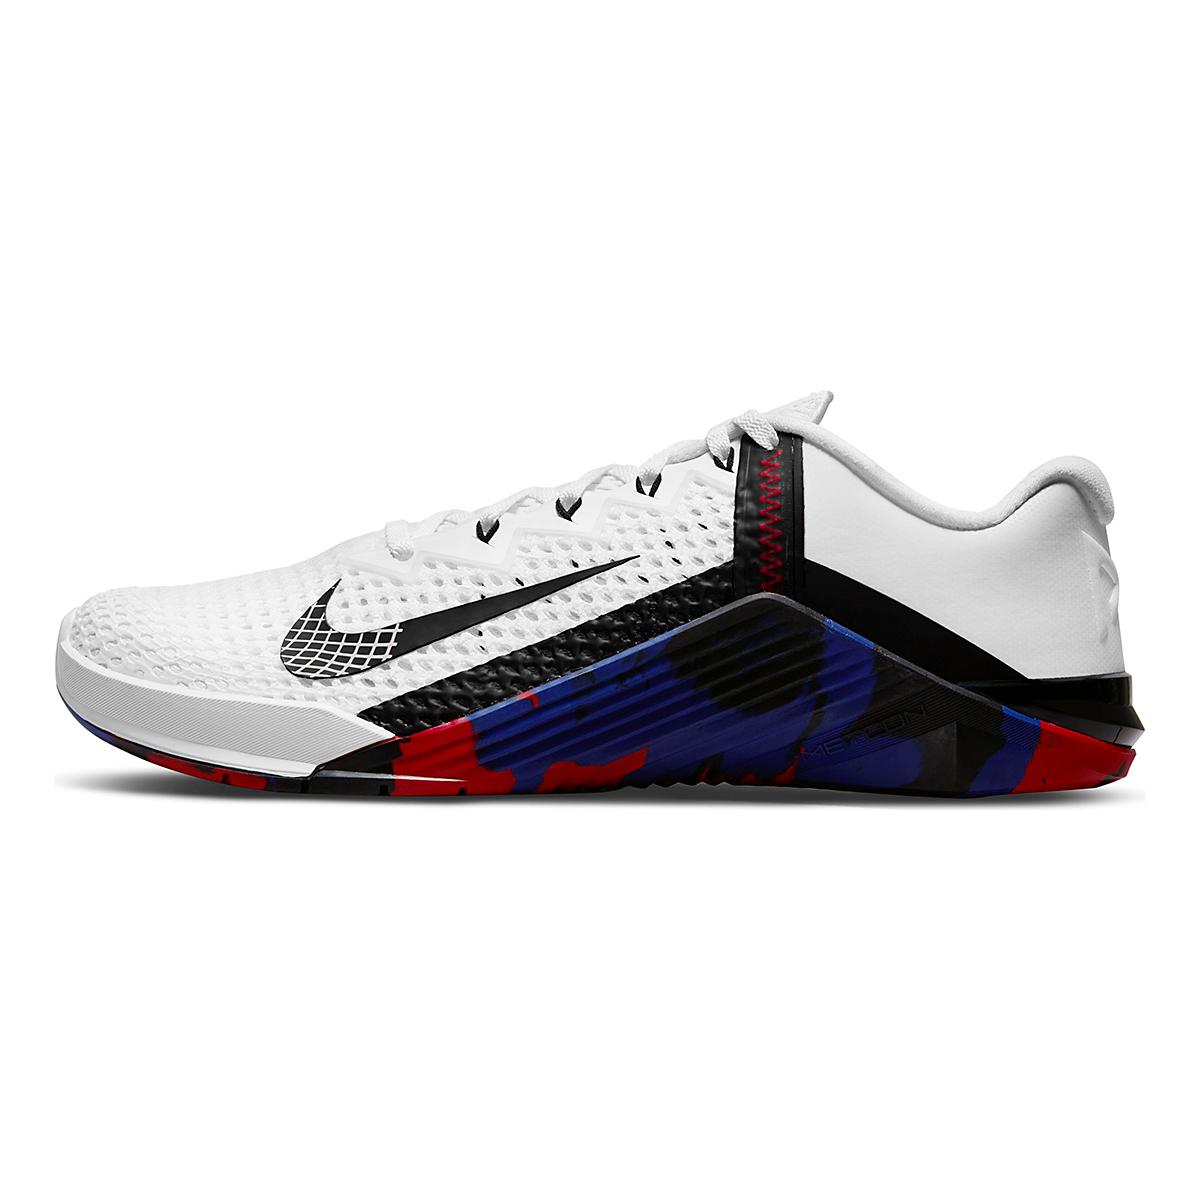 Men's Nike Metcon 6 Training Shoe - Color: White/Black/Gym Red/Deep Royal Blue - Size: 4 - Width: Regular, White/Black/Gym Red/Deep Royal Blue, large, image 2